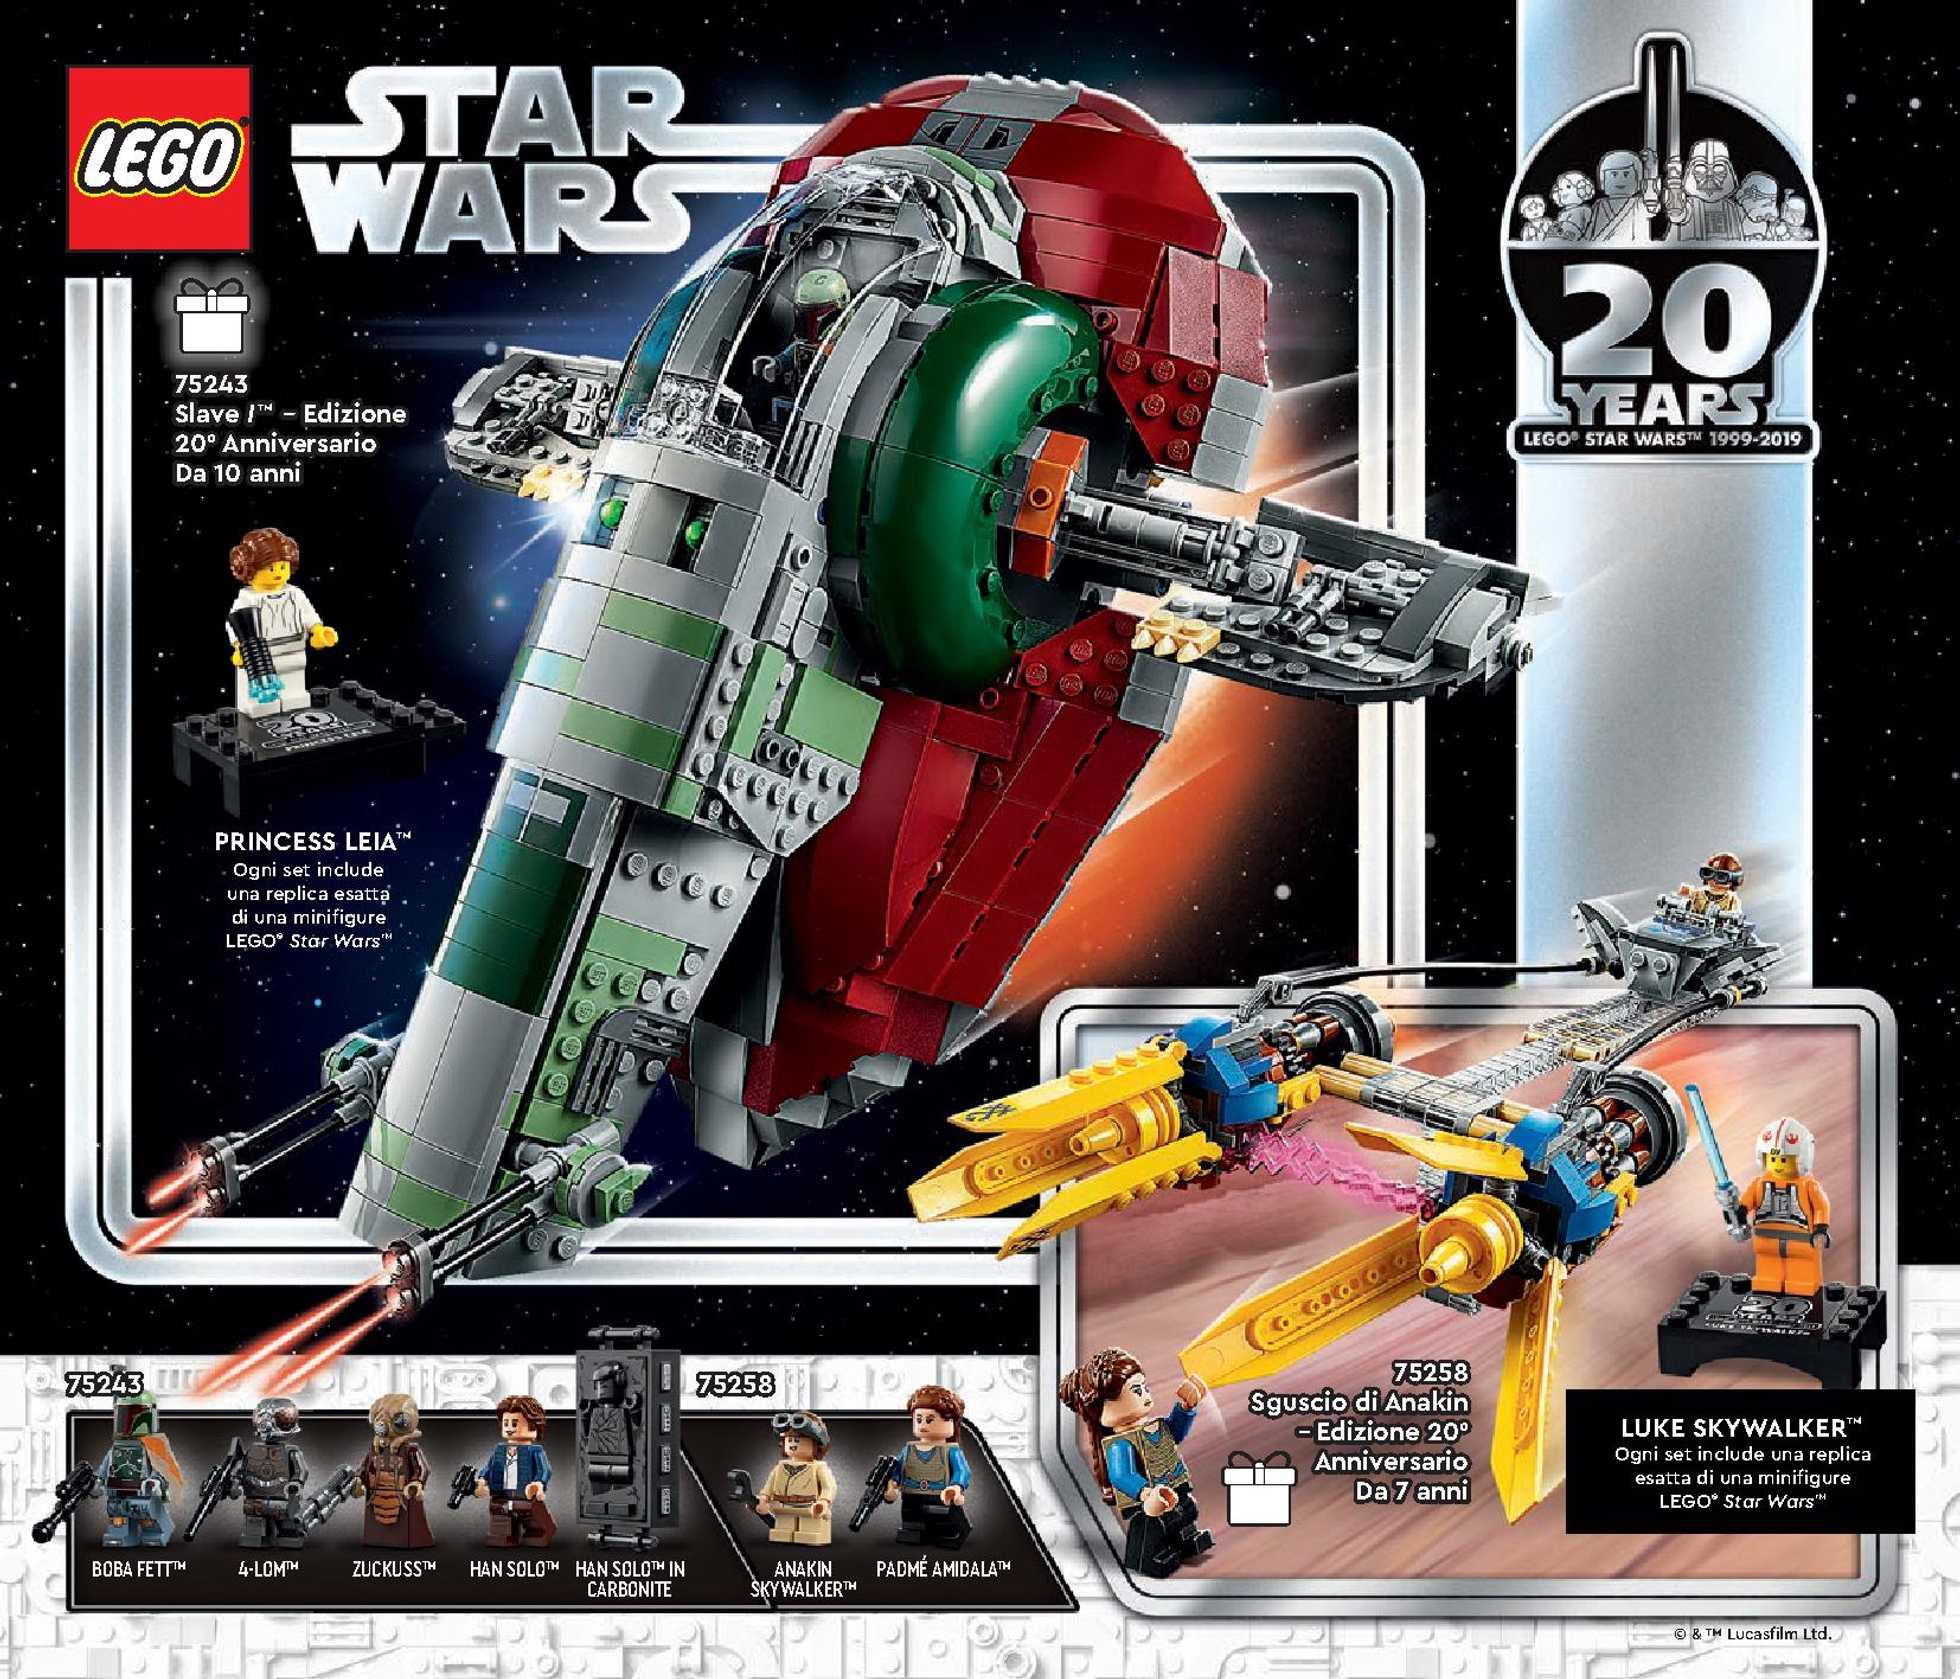 Lego - offerte valide dal 01.07.2020 al 31.12.2020 - pagina 3.